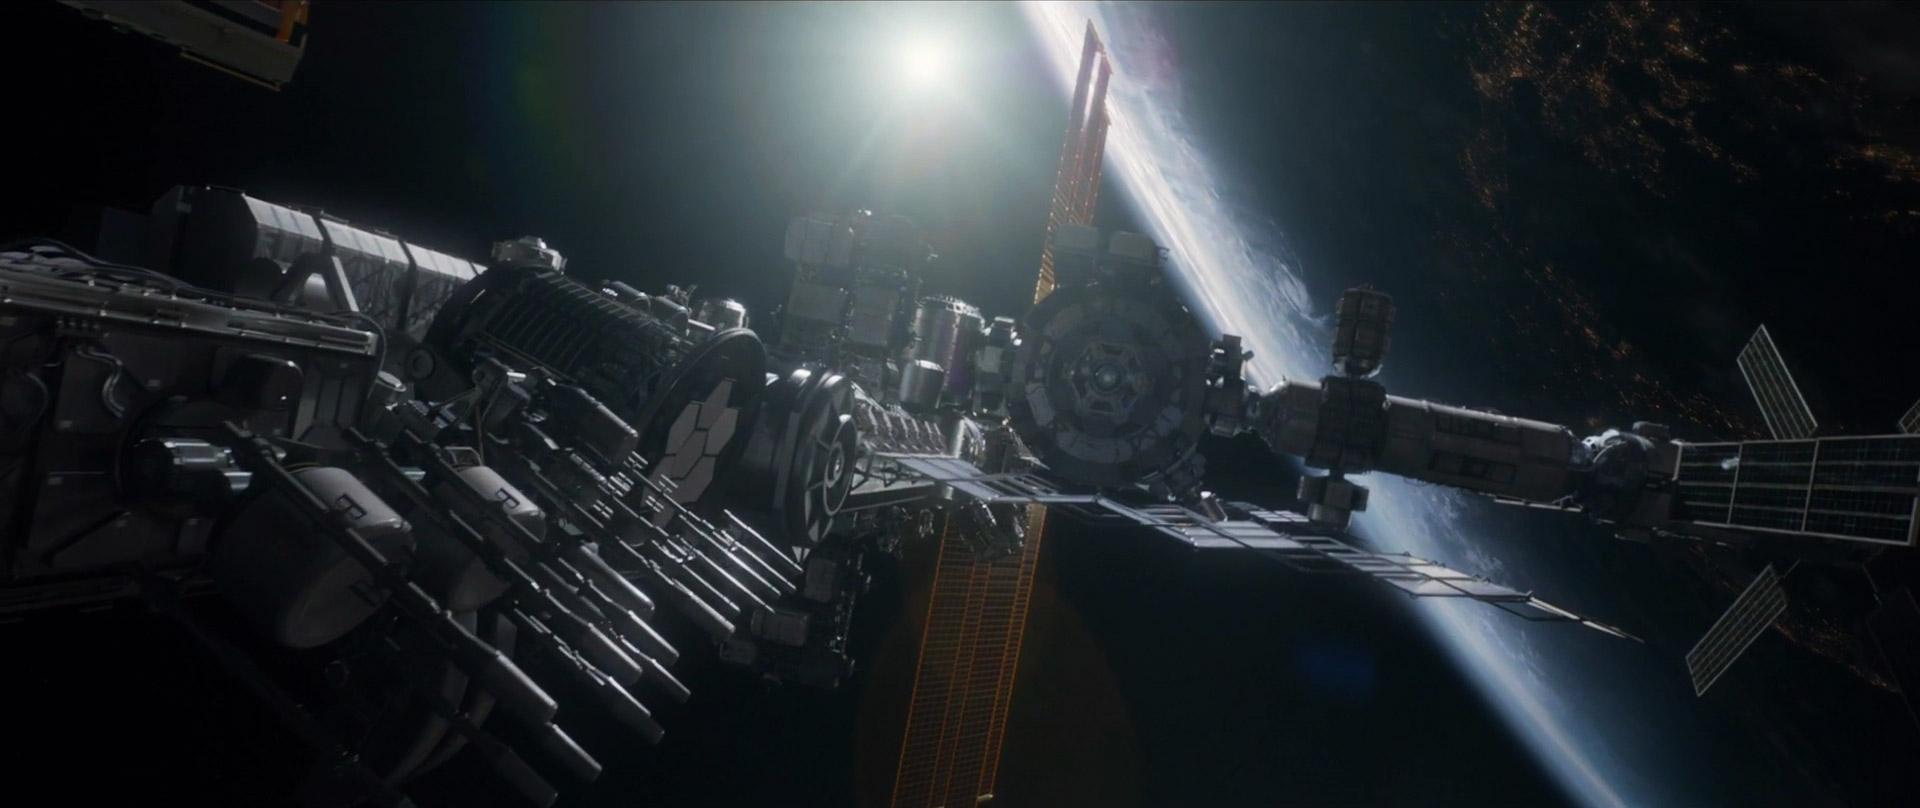 life-2017-movie-trailer-images-1.jpg